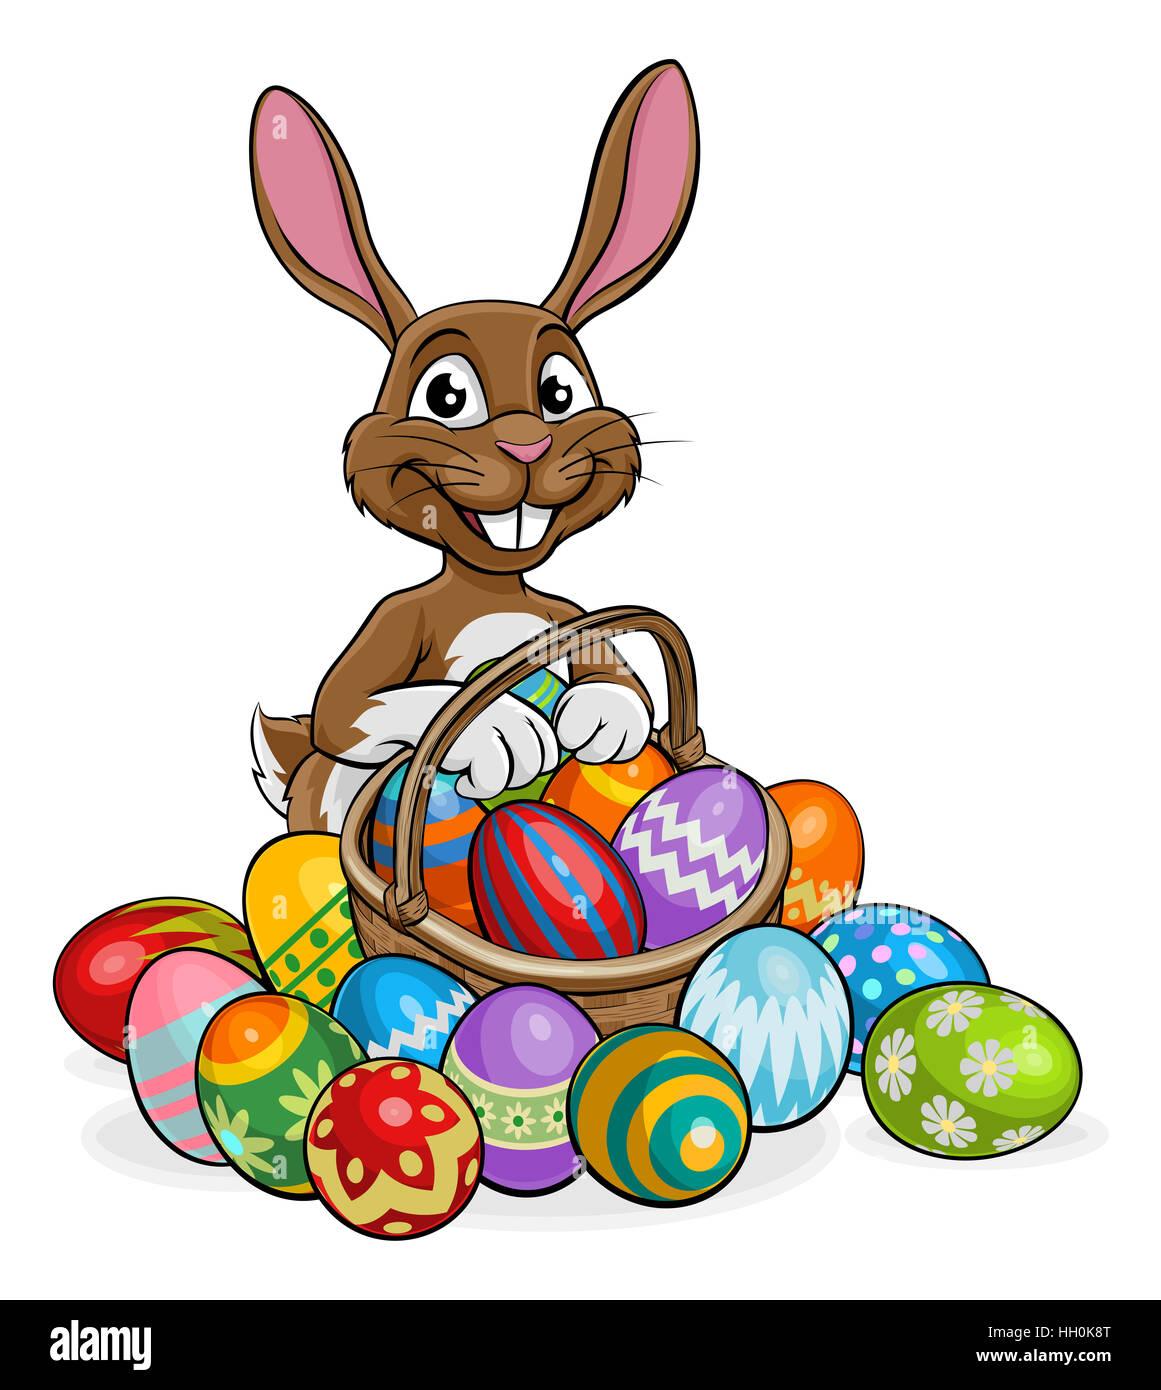 Cartoon Bunny on an Easter egg hunt with a basket or hamper Stock ... for Easter Egg Hunt Clipart  587fsj